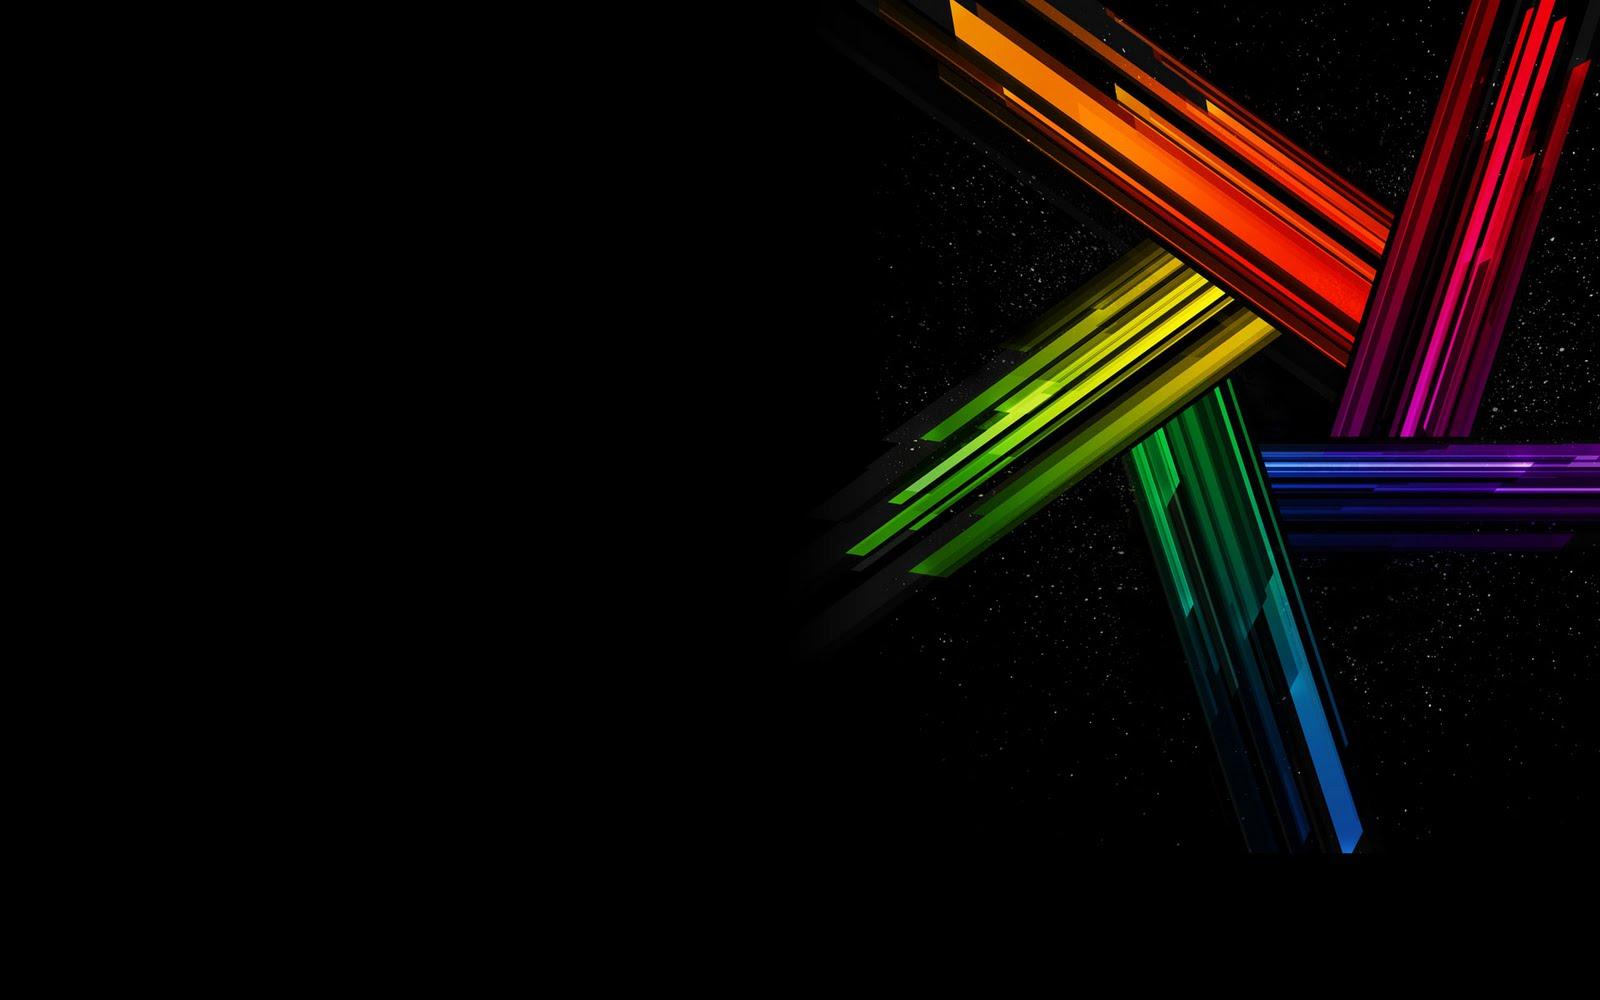 http://4.bp.blogspot.com/_r_rtt8KUl7Y/S--xPwF_d2I/AAAAAAAAAIE/SSf5_bFaJs4/s1600/Colorful-glass-black.jpg